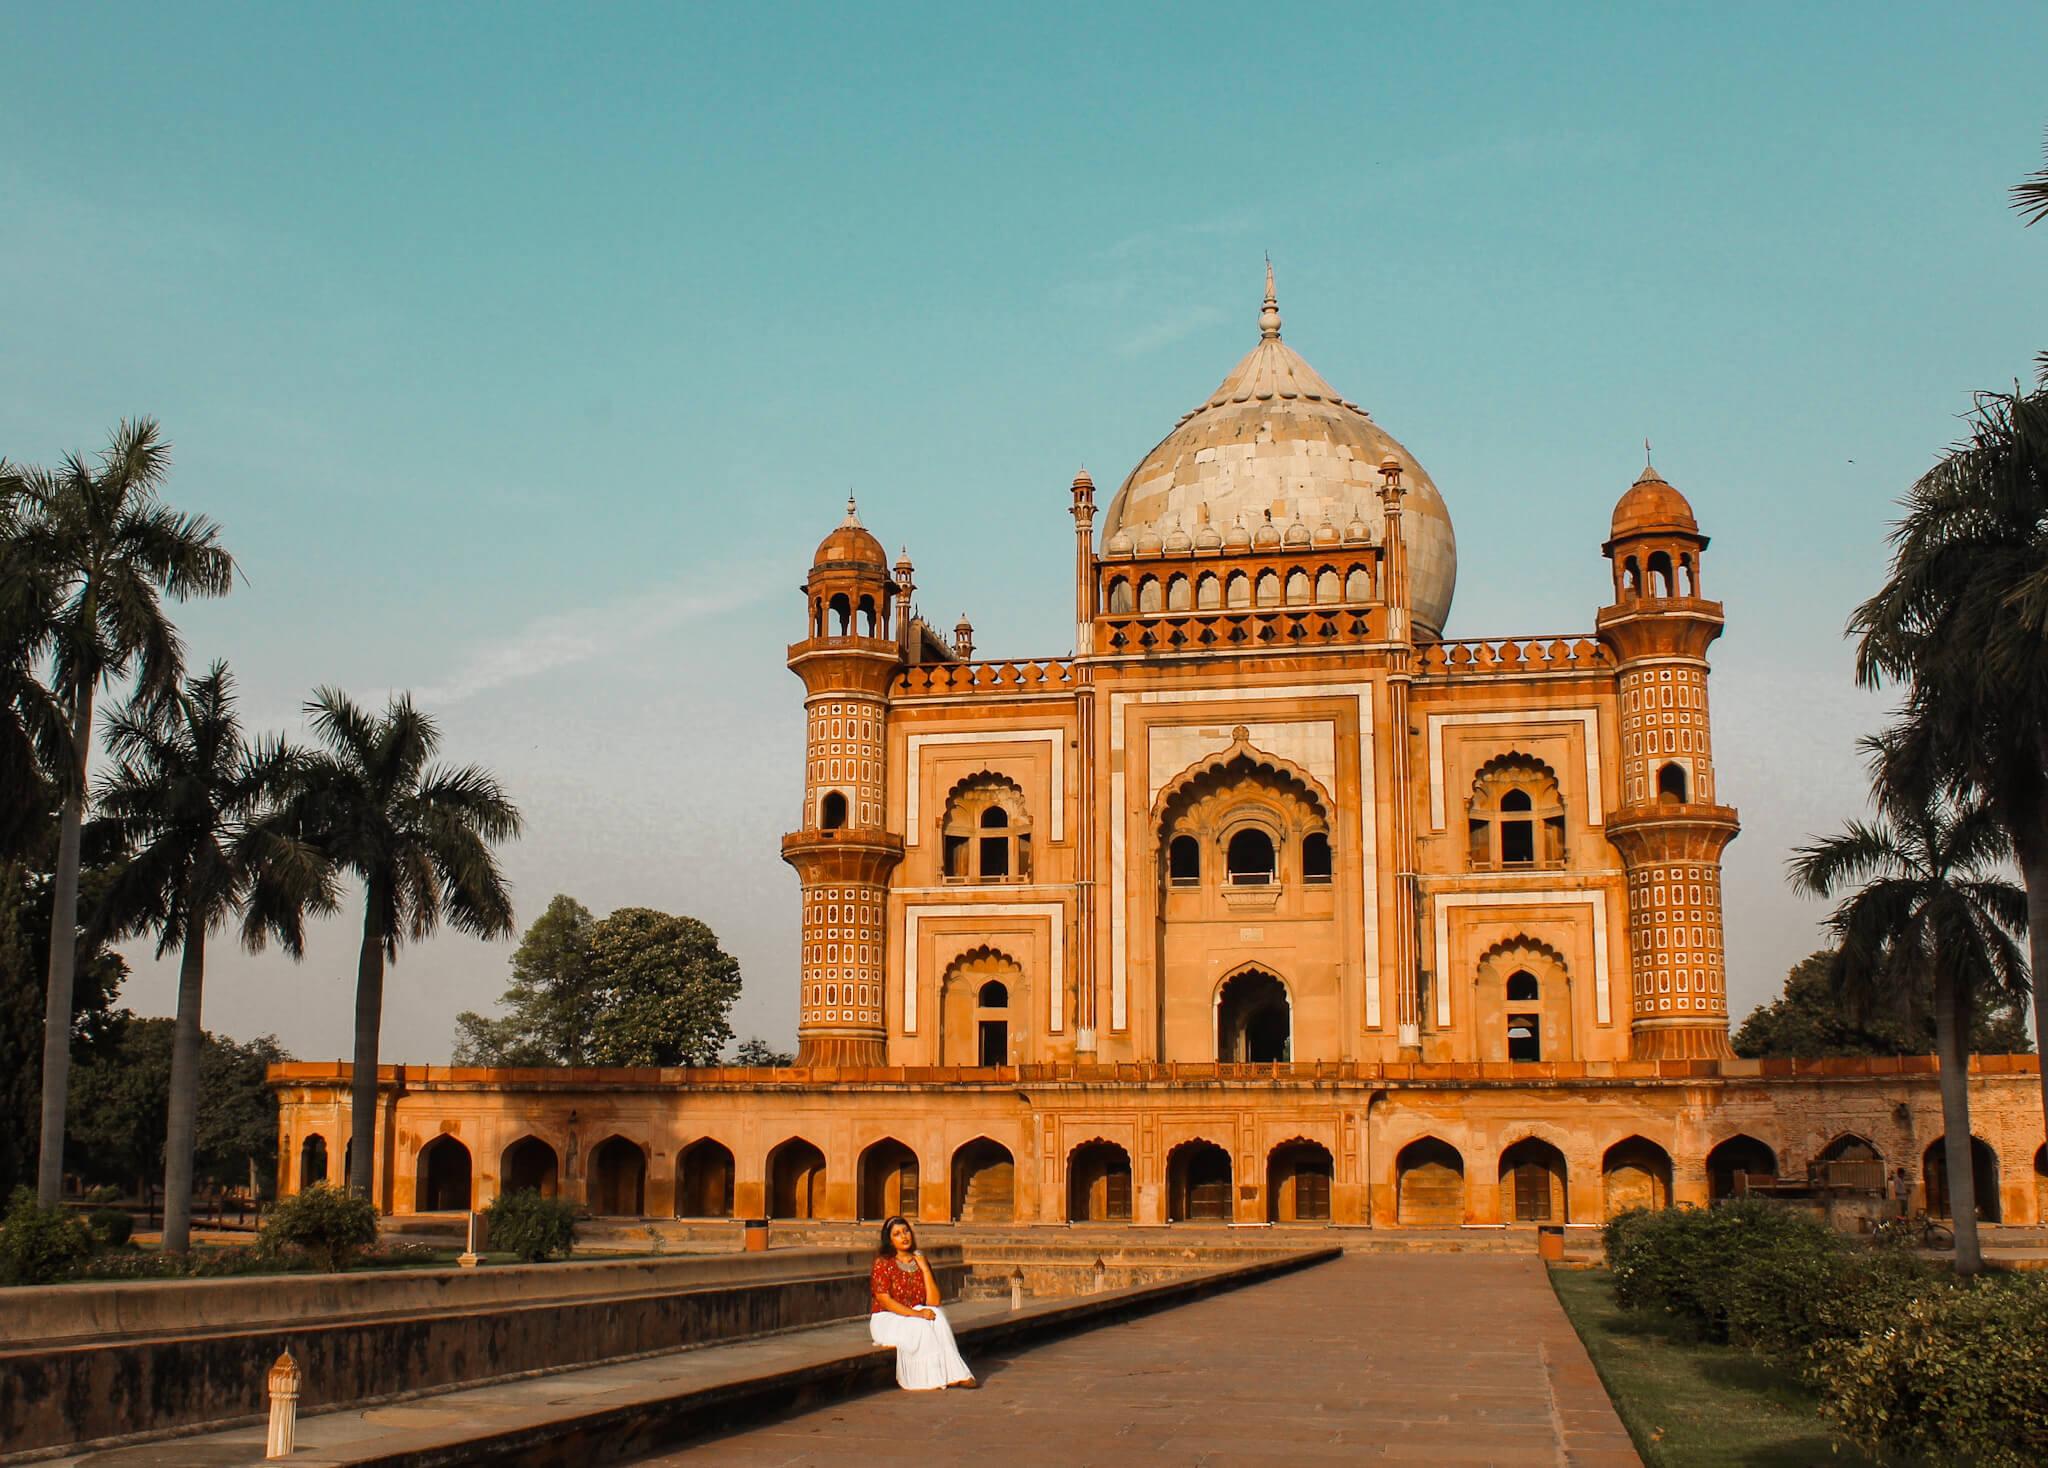 Top 8 Instagrammable Places in Delhi – A Delhi Photo Guide